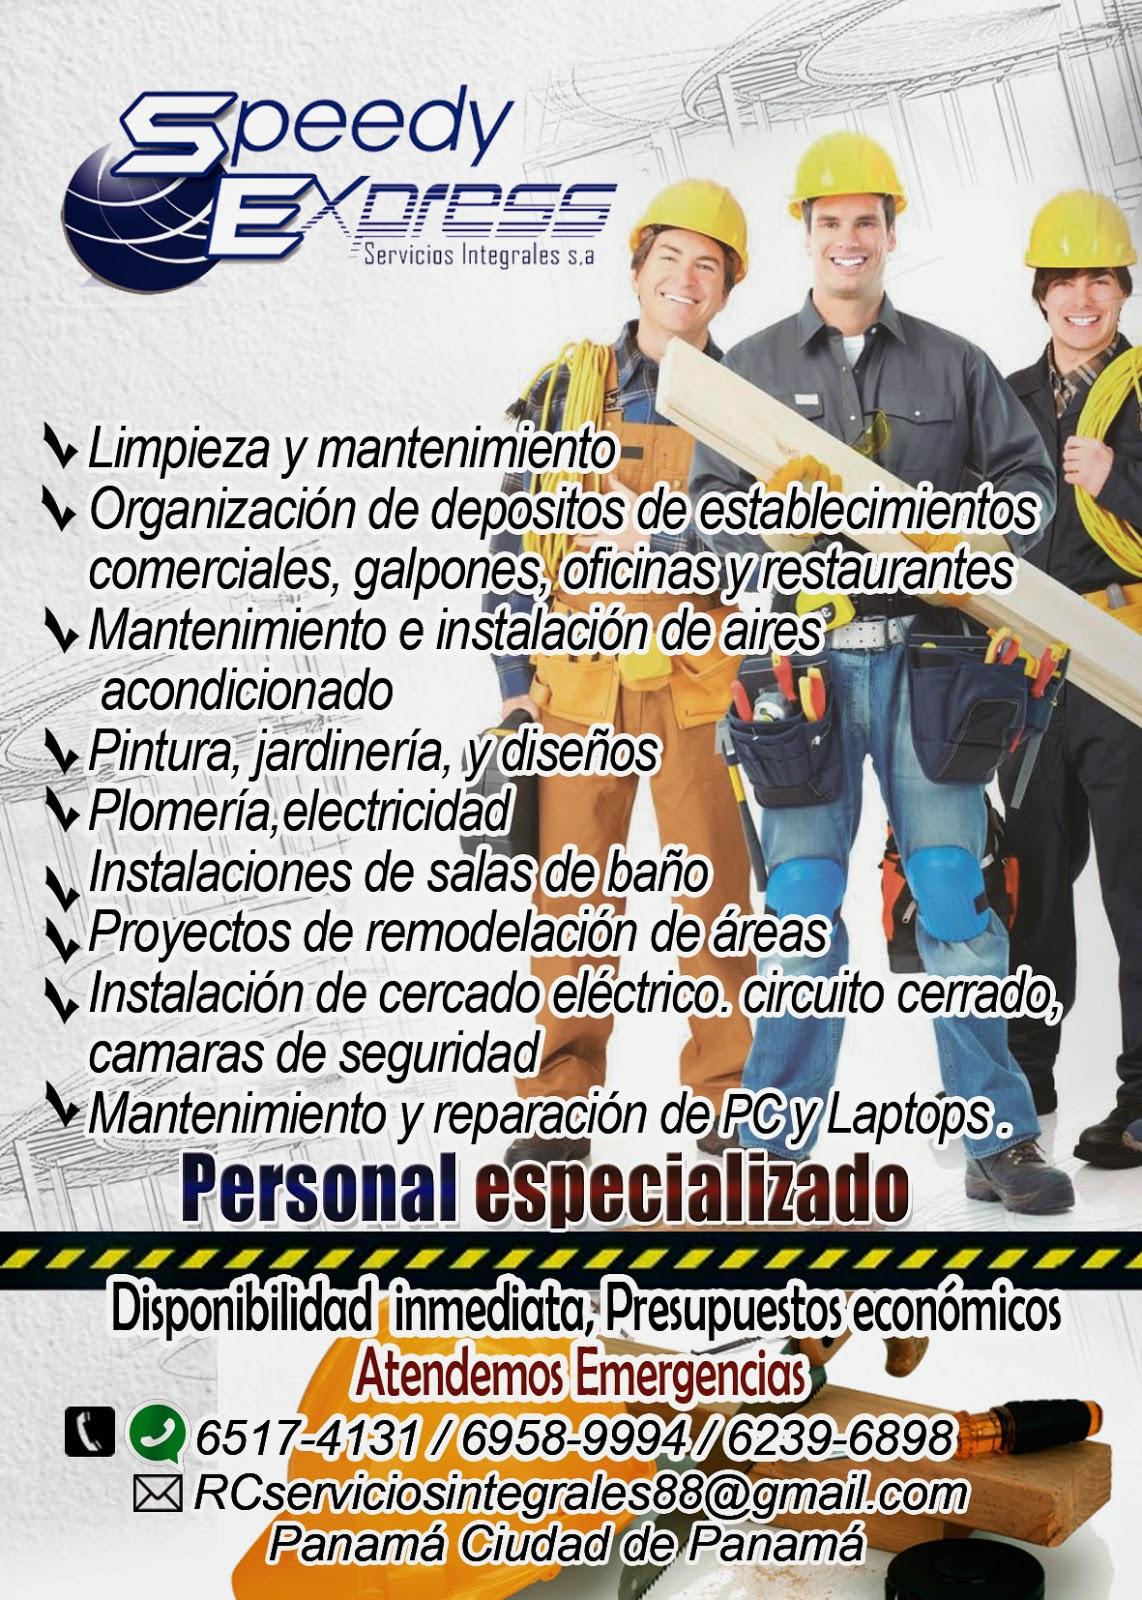 Speedy express s a servicios integrales servicios for Servicios de construccion